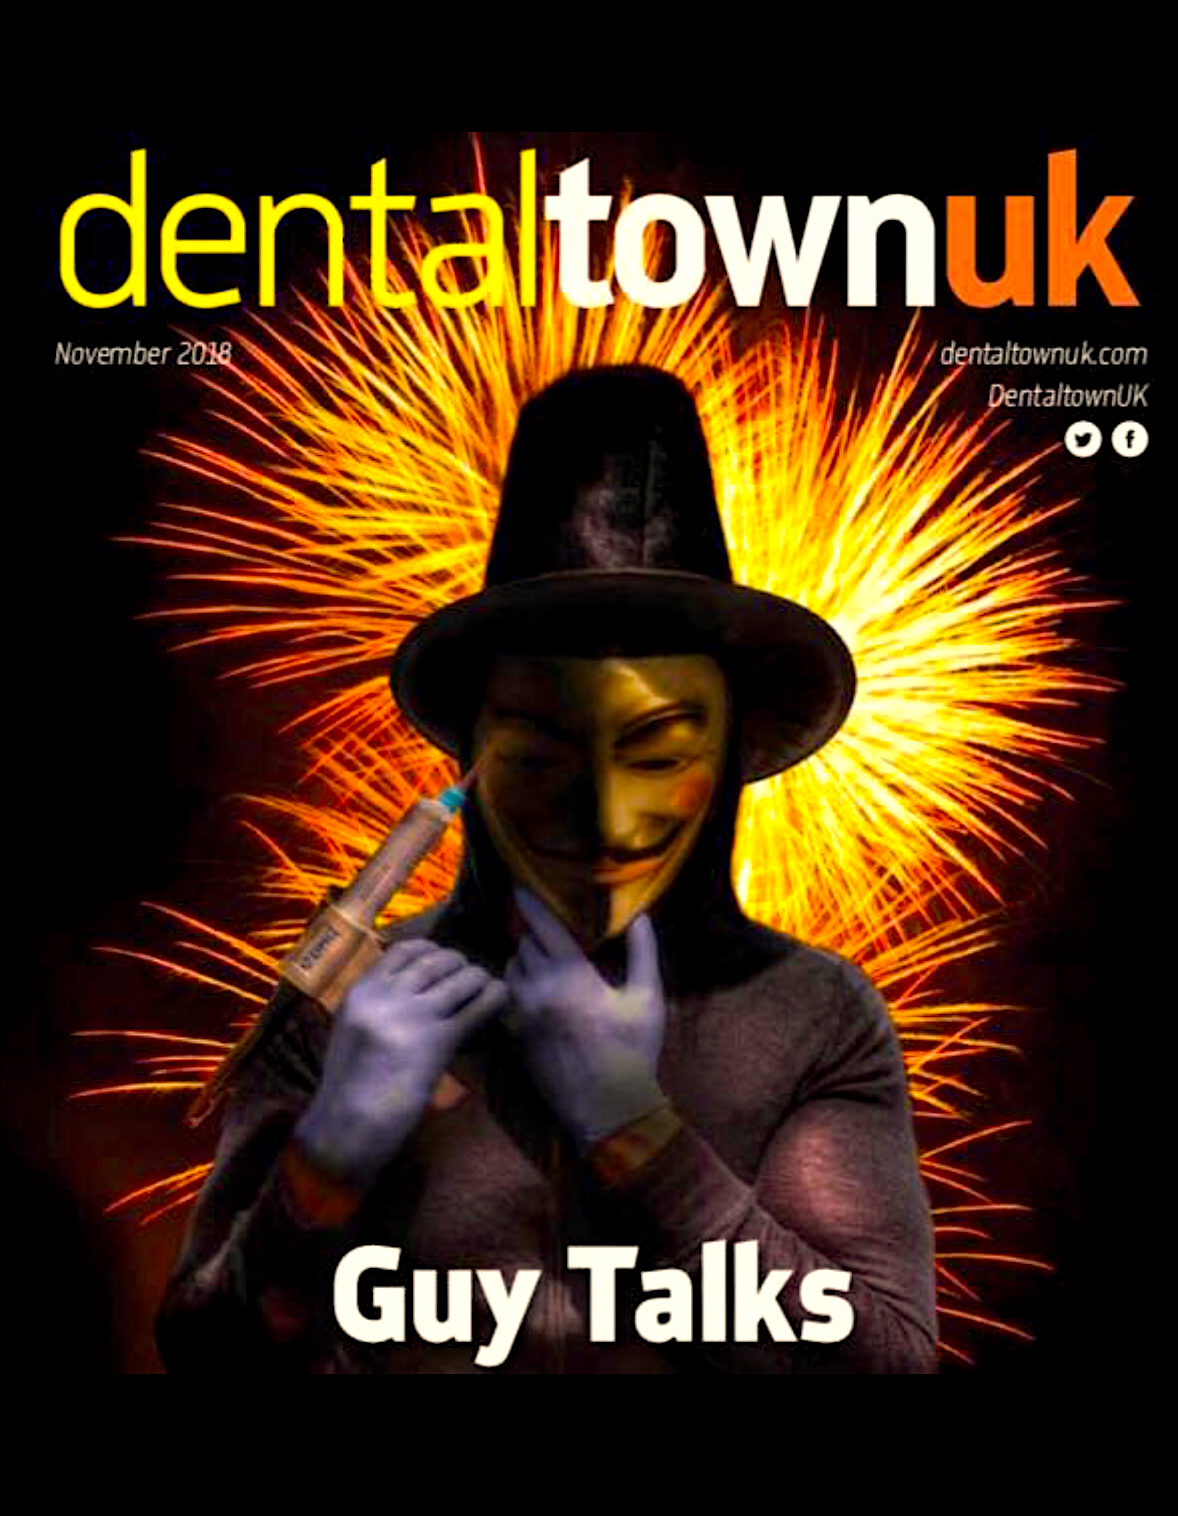 dentaltownguy.jpg